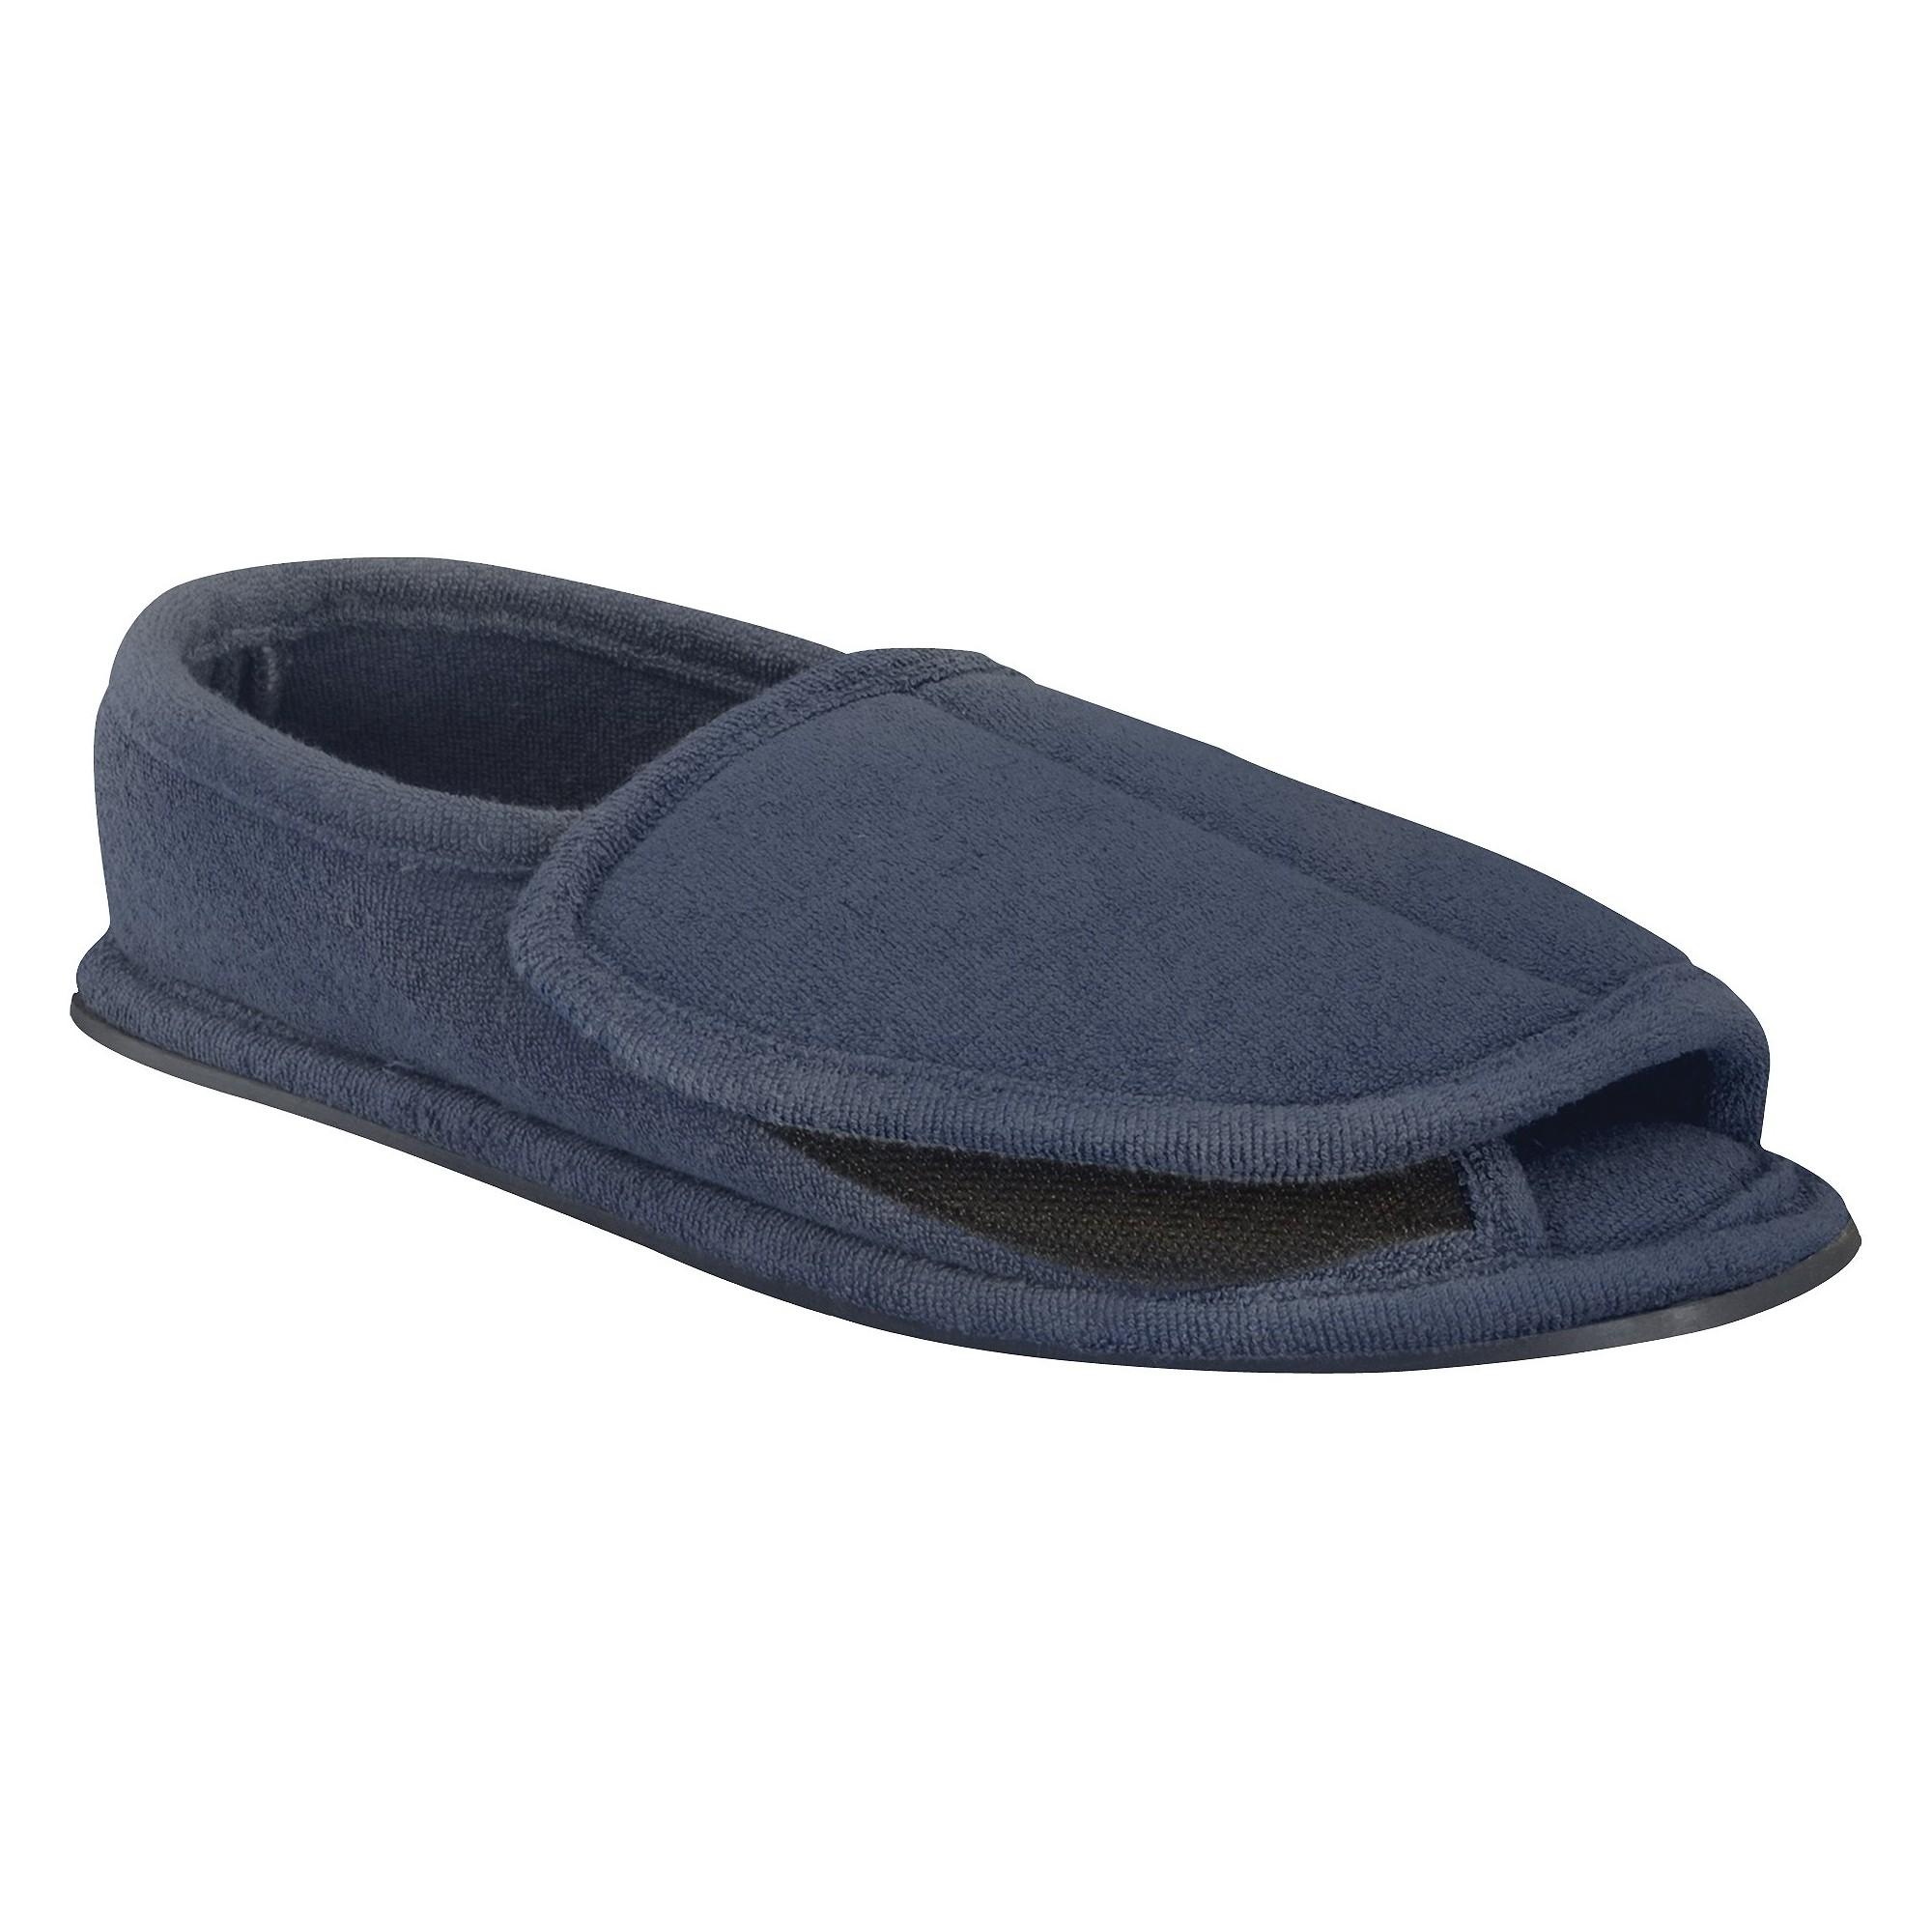 Men's MUK LUKS Adjustable Open Toe Slipper - Navy S(7-9), Size: Small (7-9), Blue